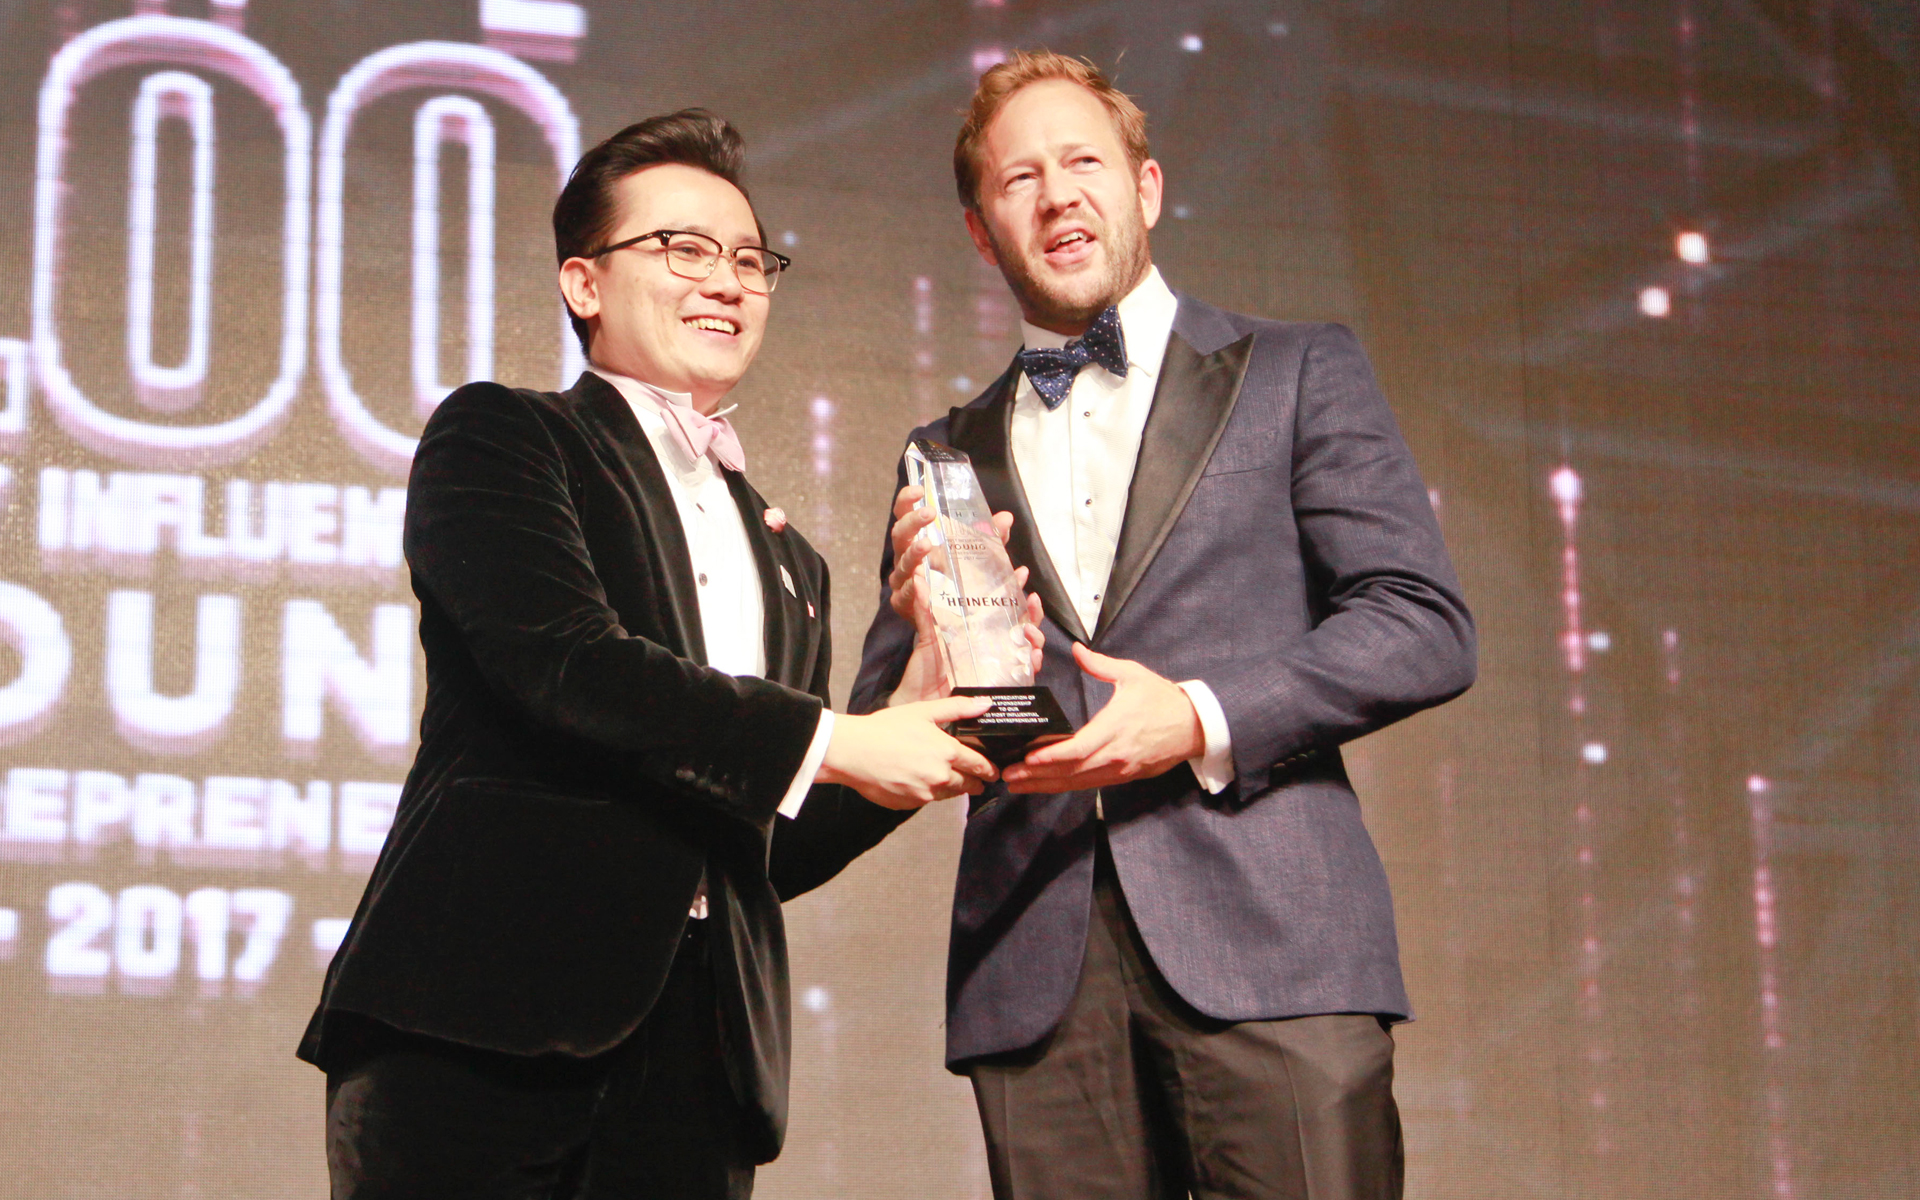 KK Chua handing over an award to Jirka Rakosnik, marketing director of Heineken Malaysia